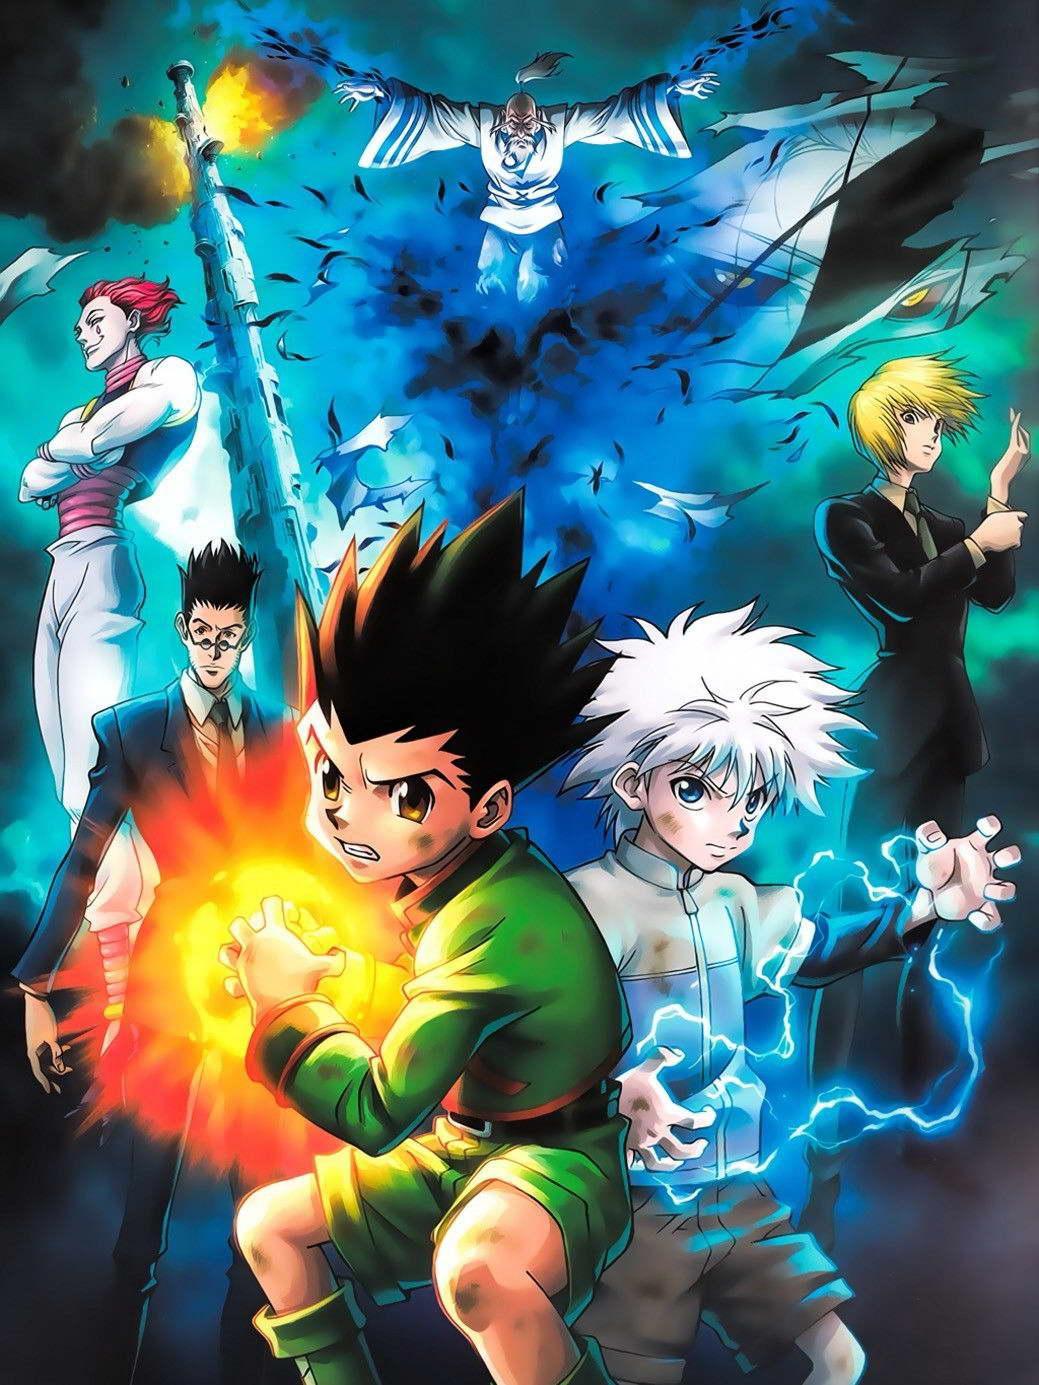 18074 Hunter x Hunter The Last Mission Anime Wall Print POSTER AU